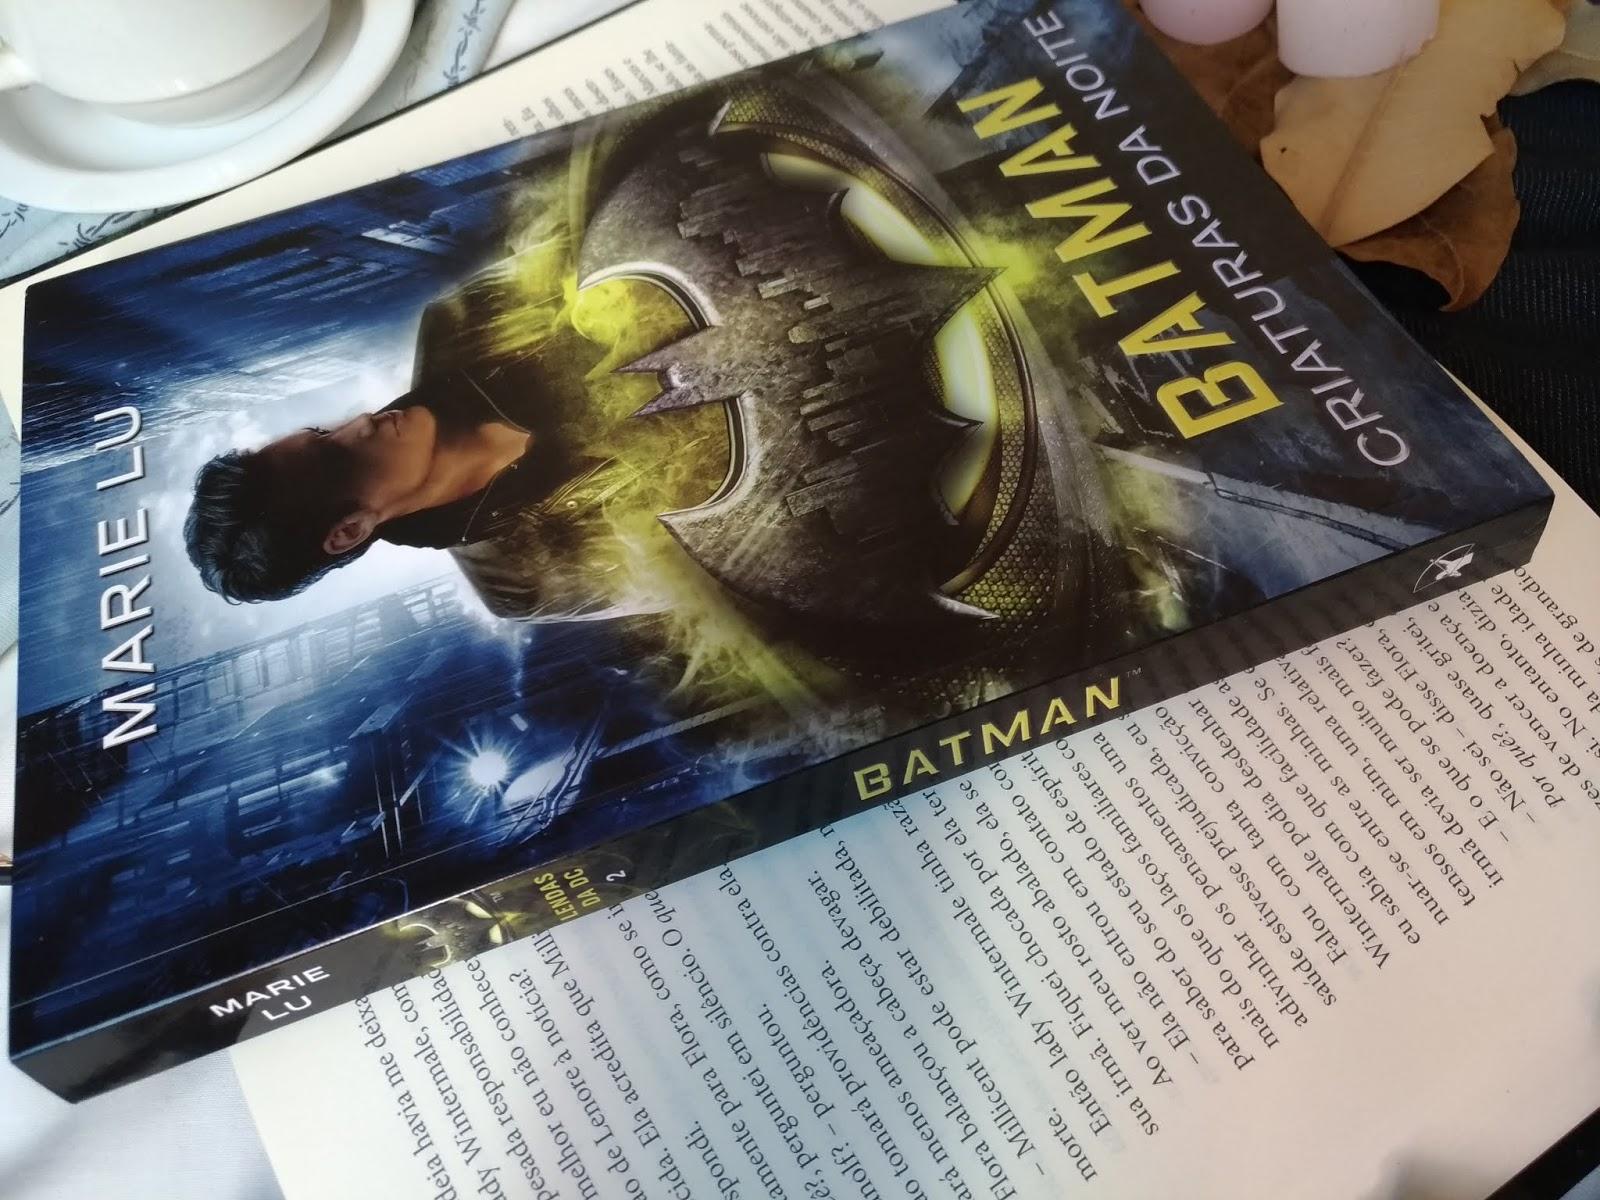 RESENHA: BATMAN: CRIATURAS DA NOITE - MARIE LU (LENDAS DA DC #2)